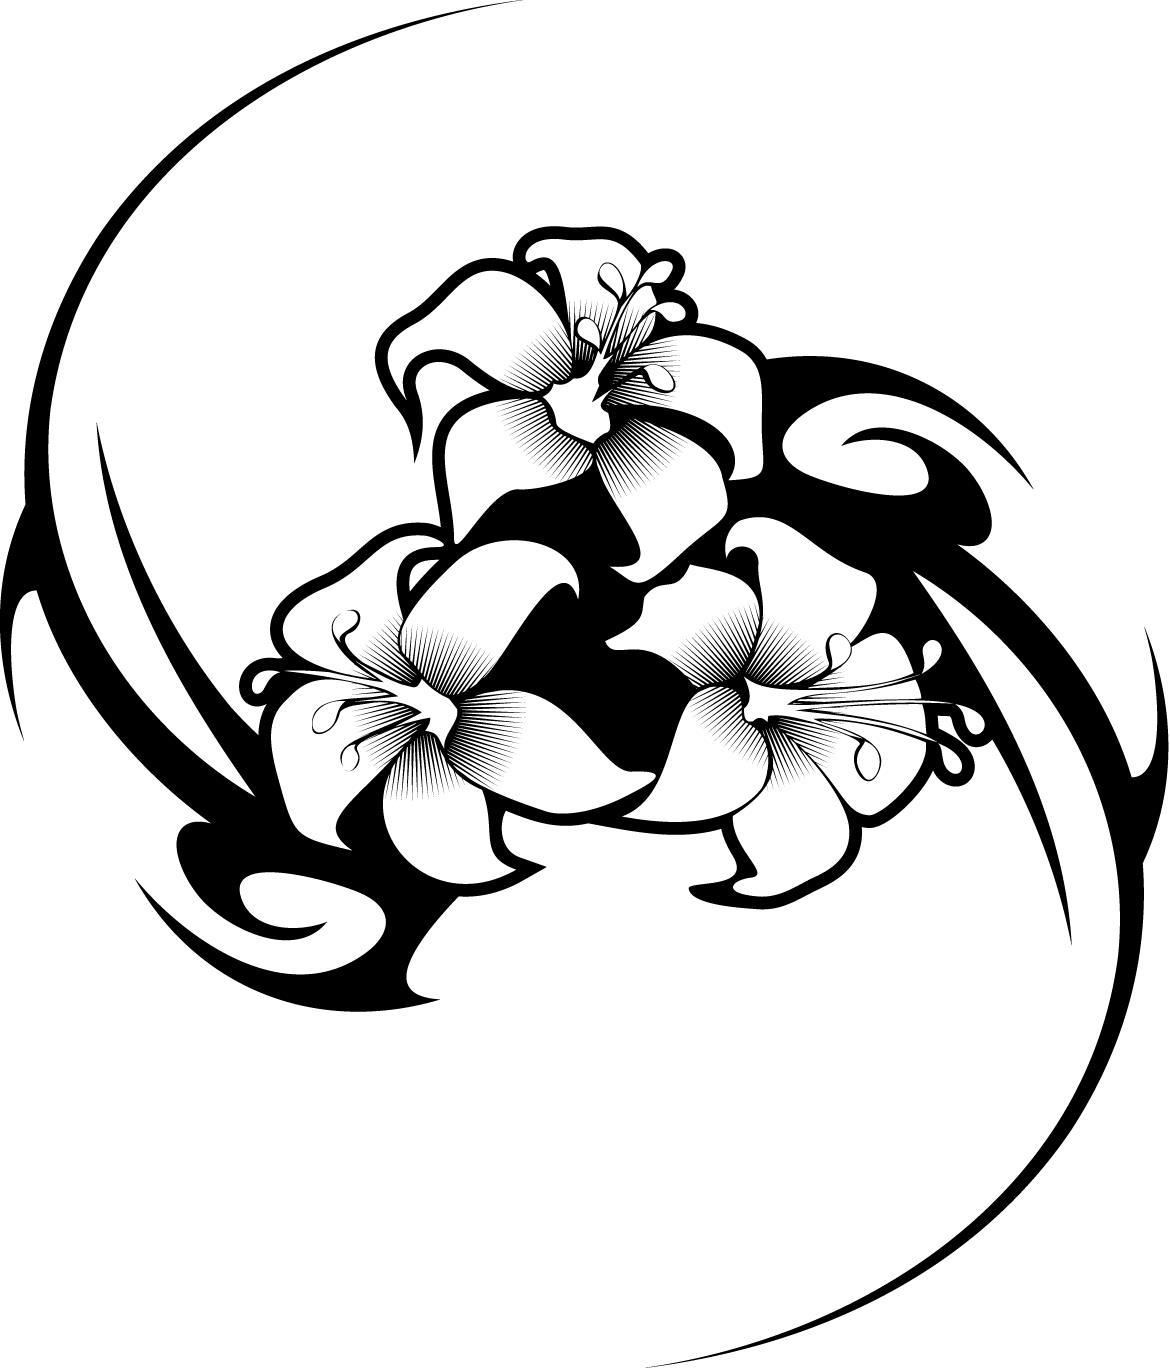 Hibiscus Flower Tribal Tattoo Designs Free Image